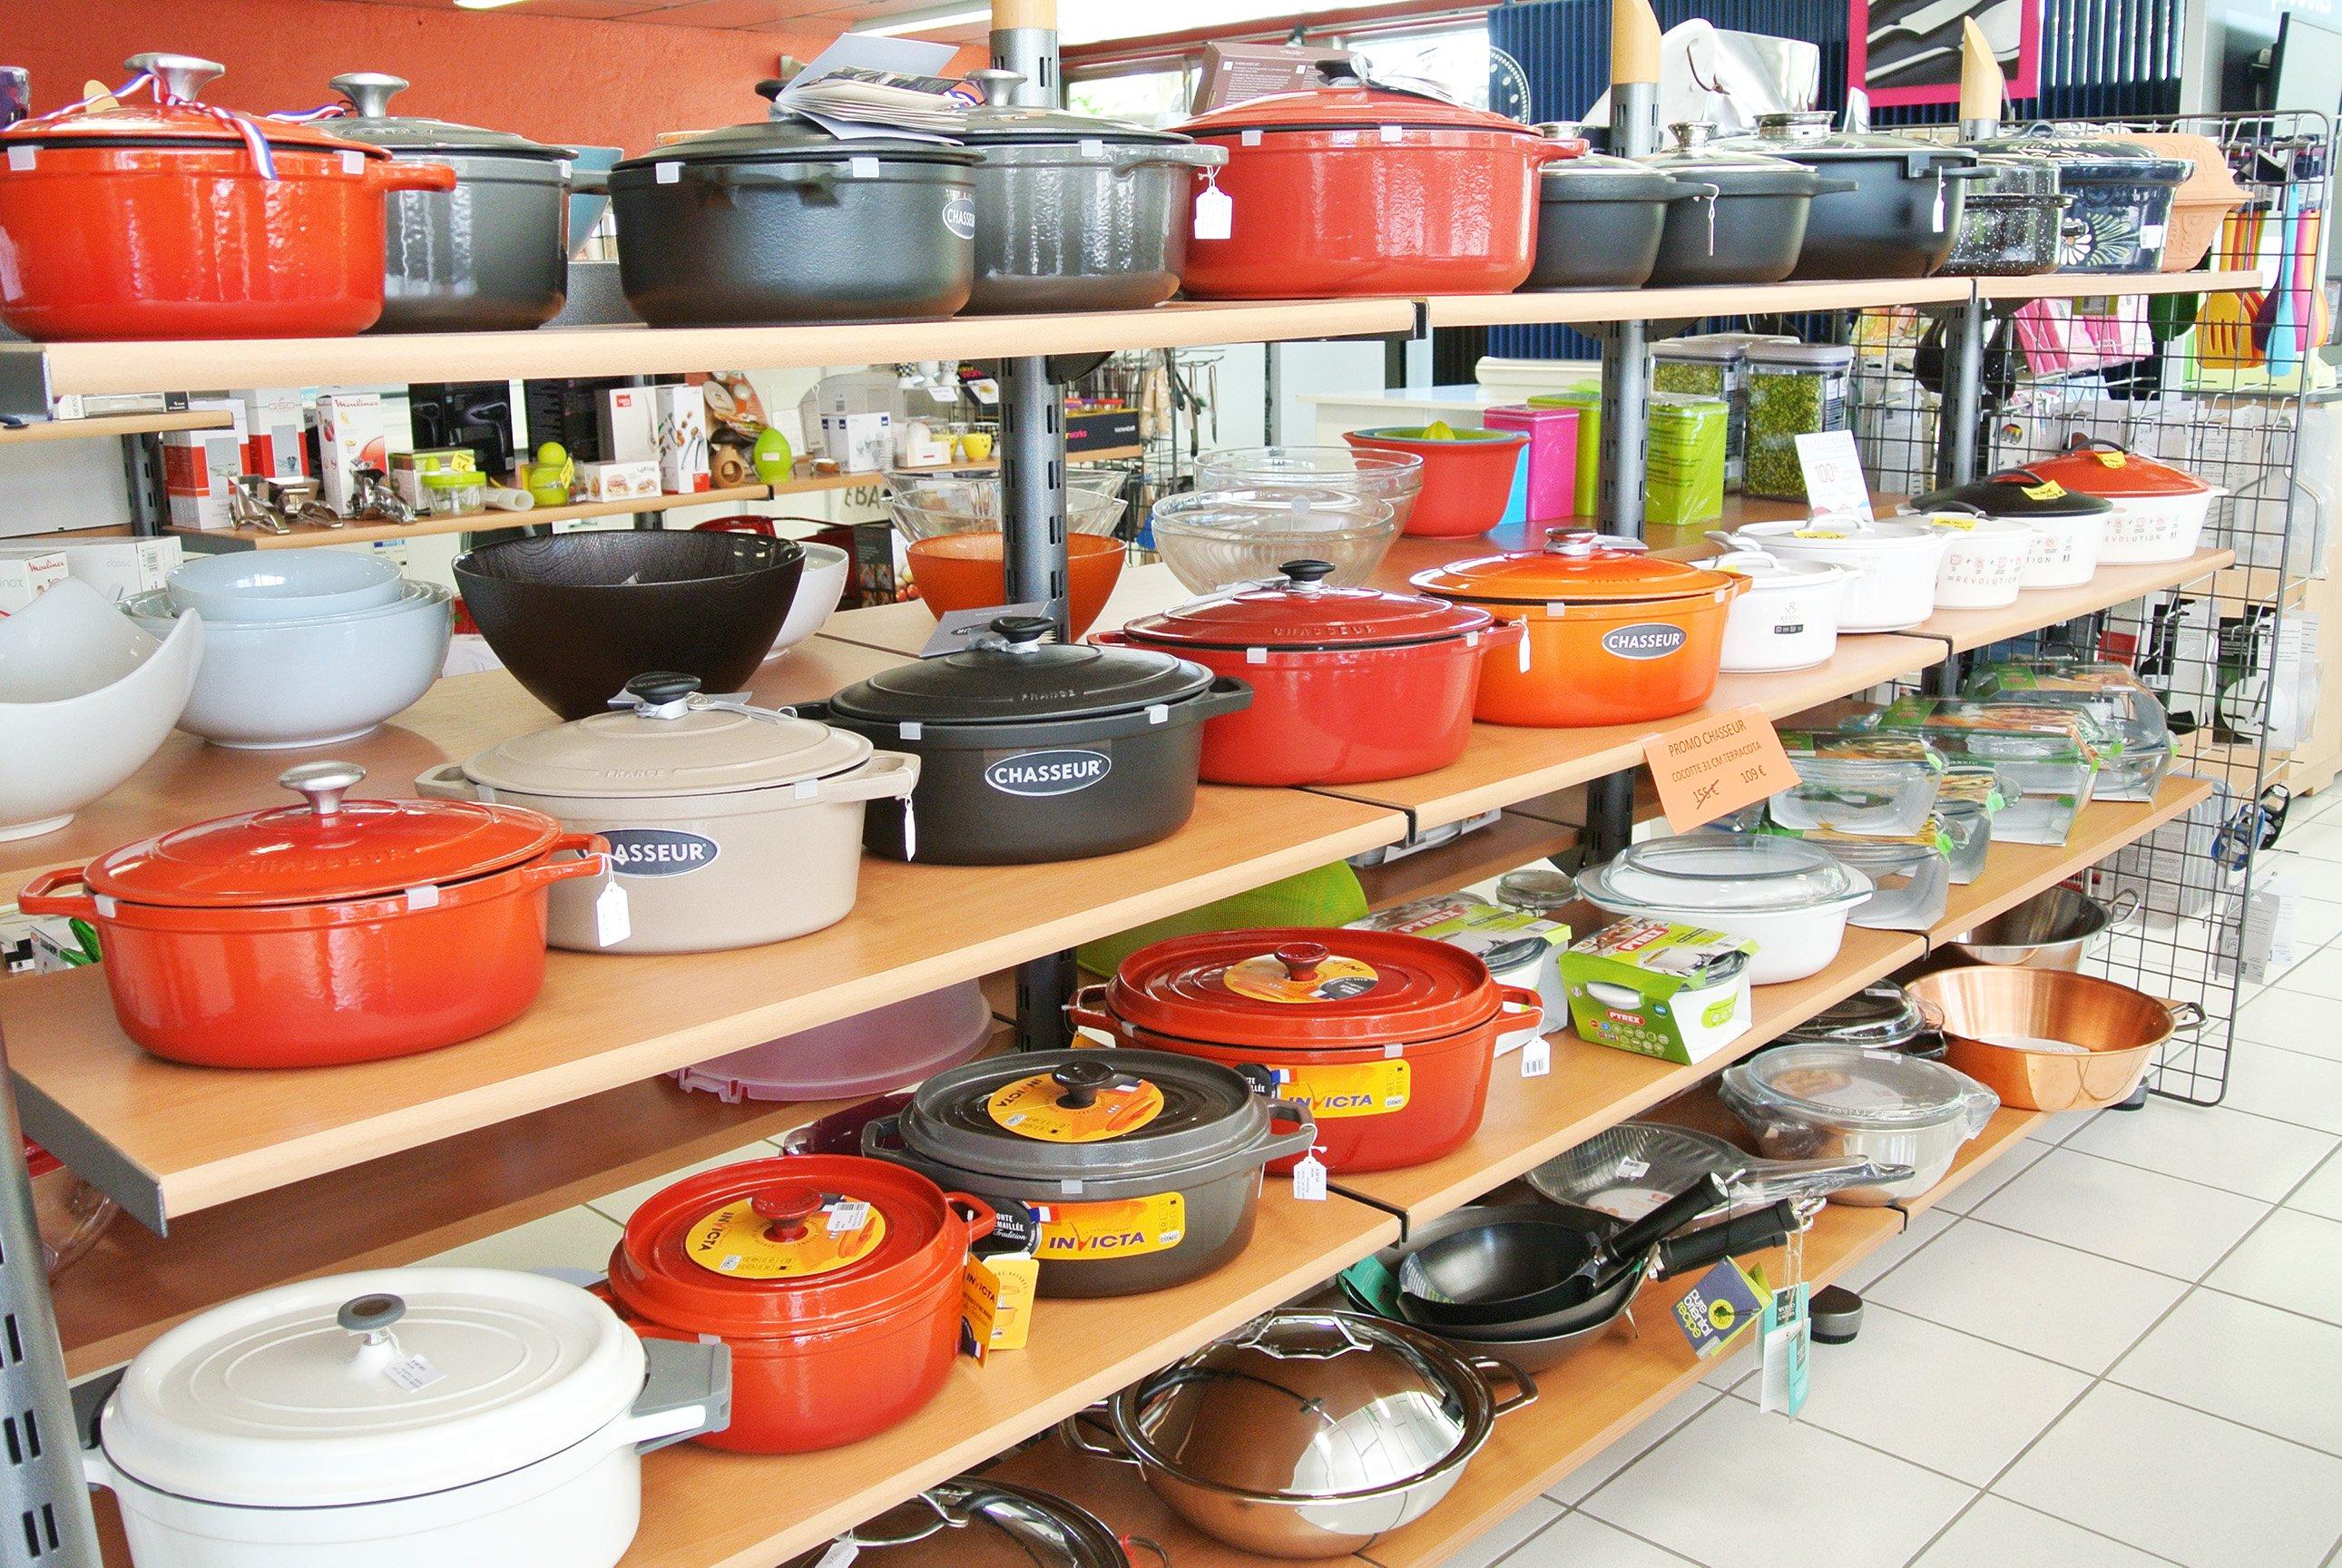 Electromenager Sani Cuisine